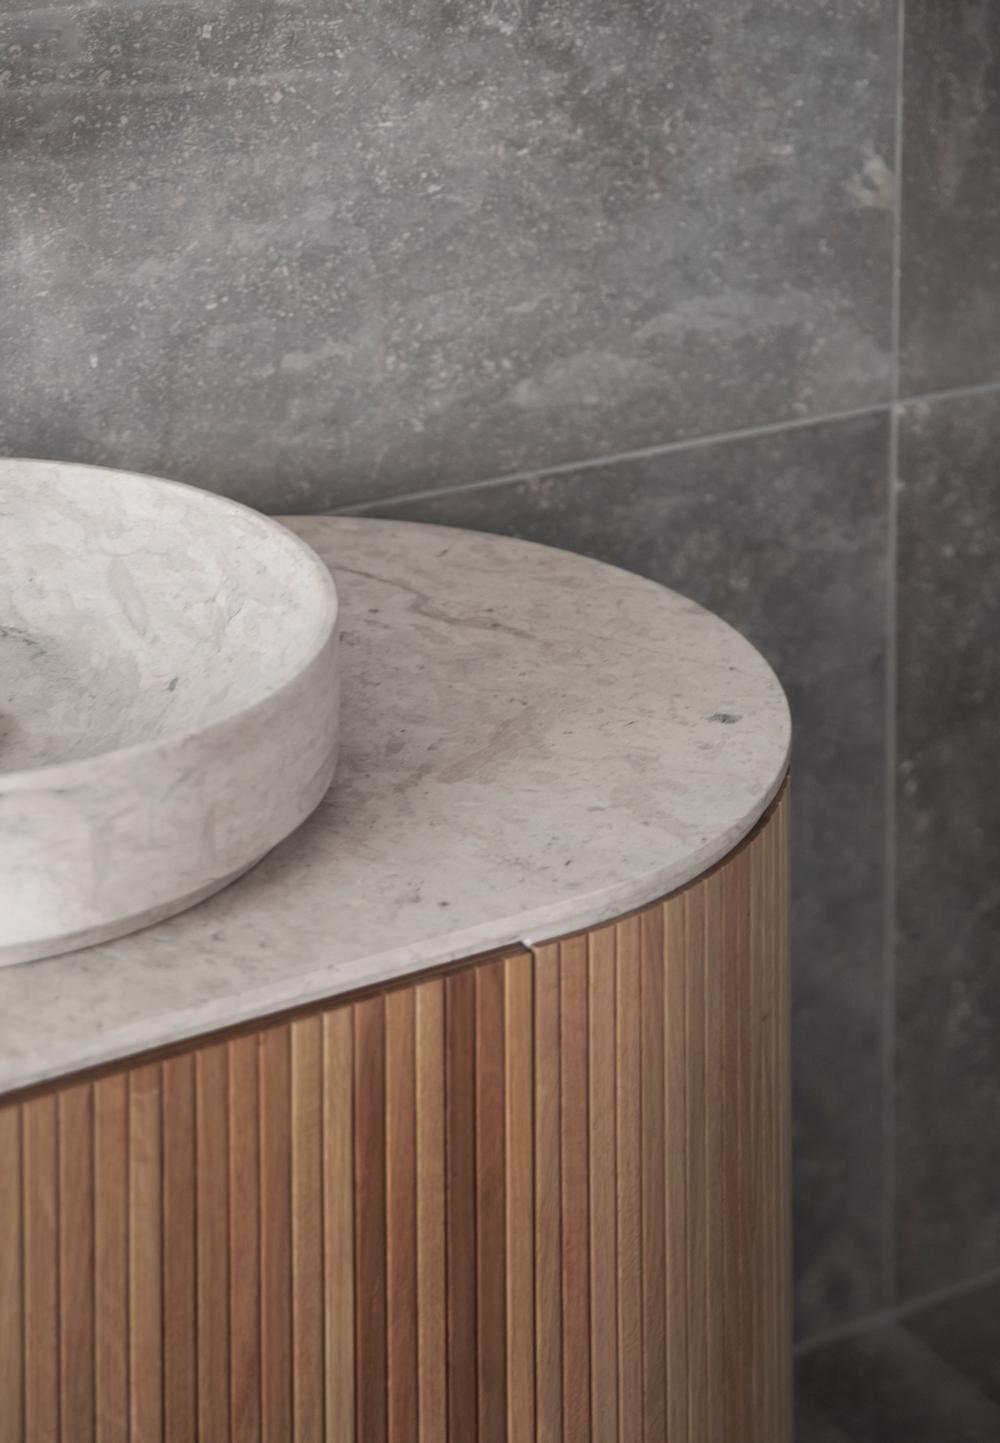 ilaria fatone - minimal esthetics - bathroom